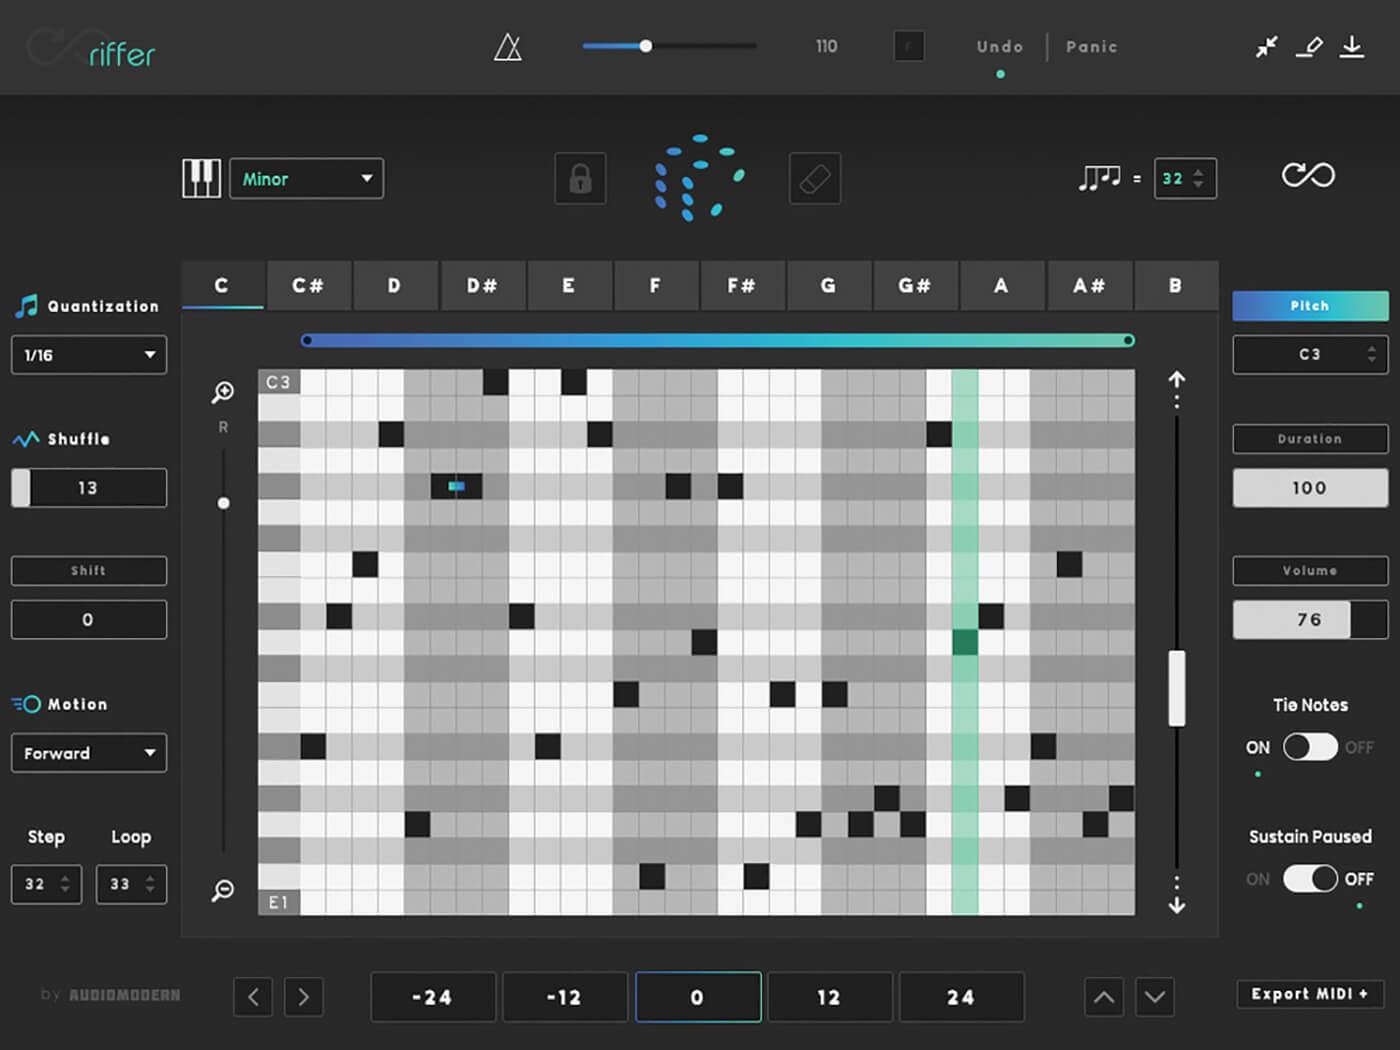 Audiomodern - Riffer